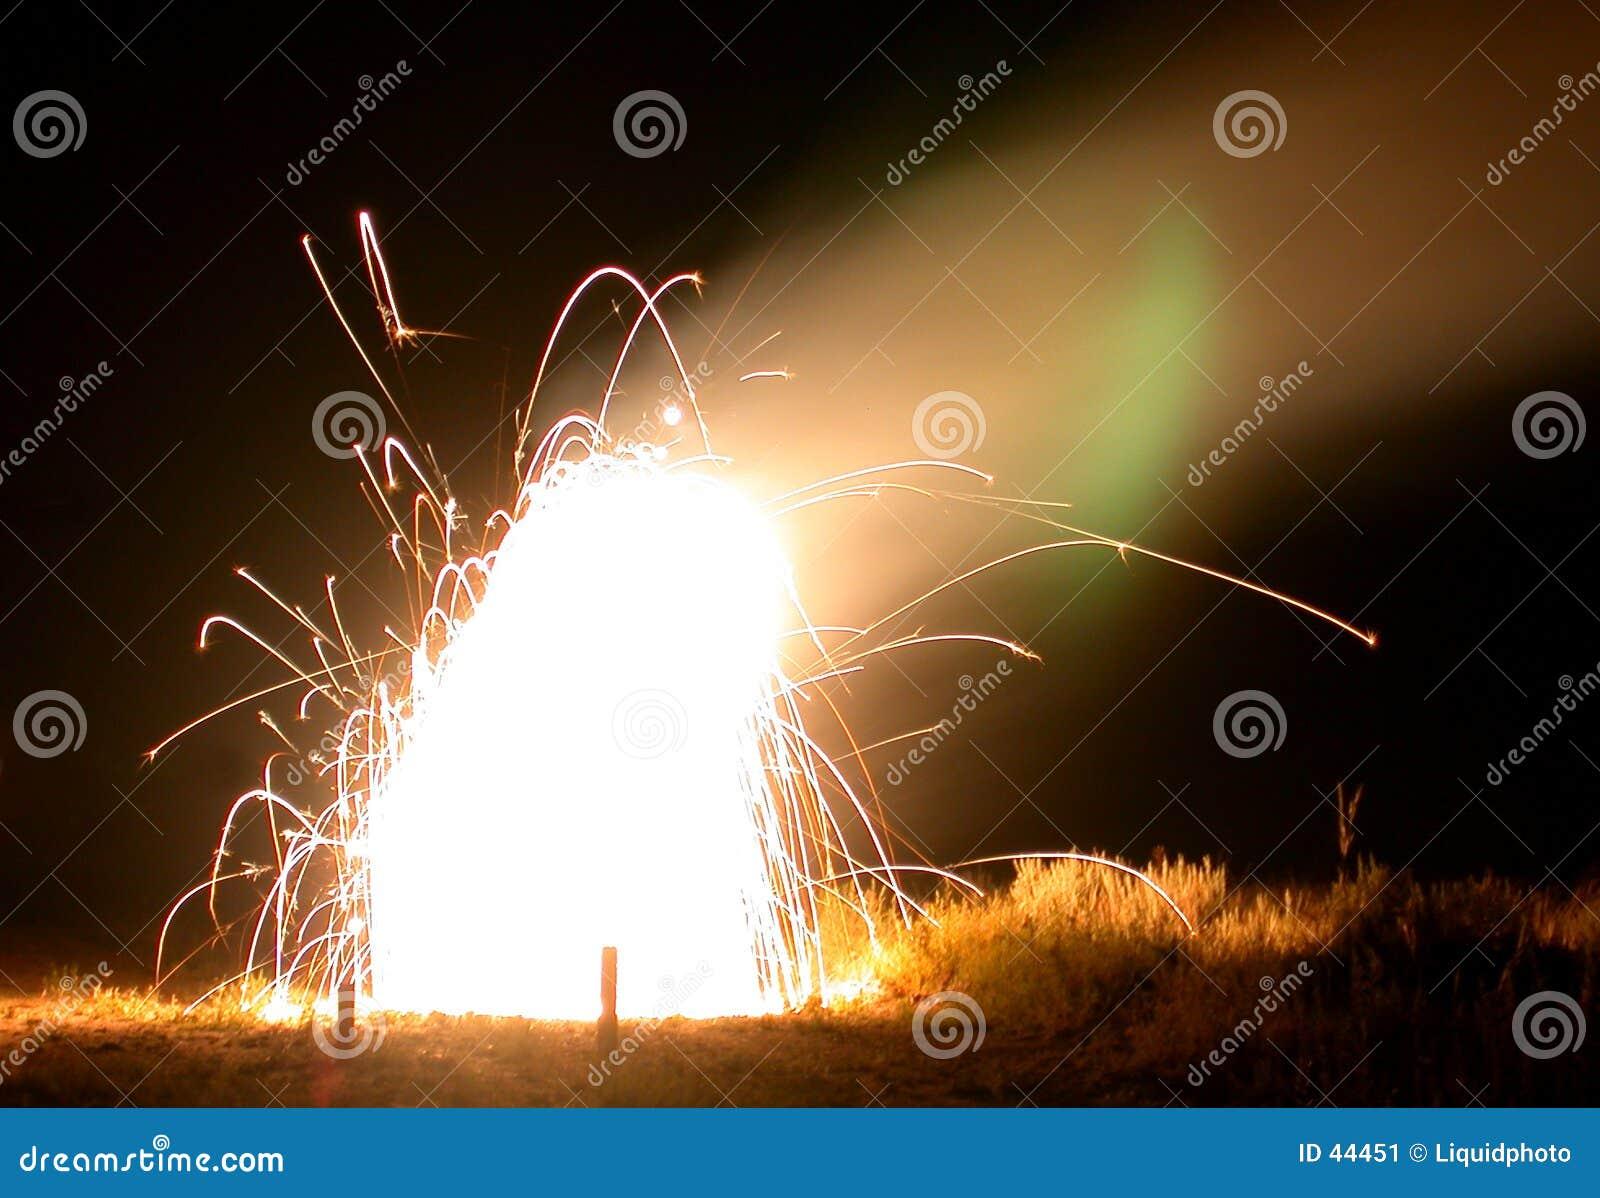 Sztuczne ognie ogniska